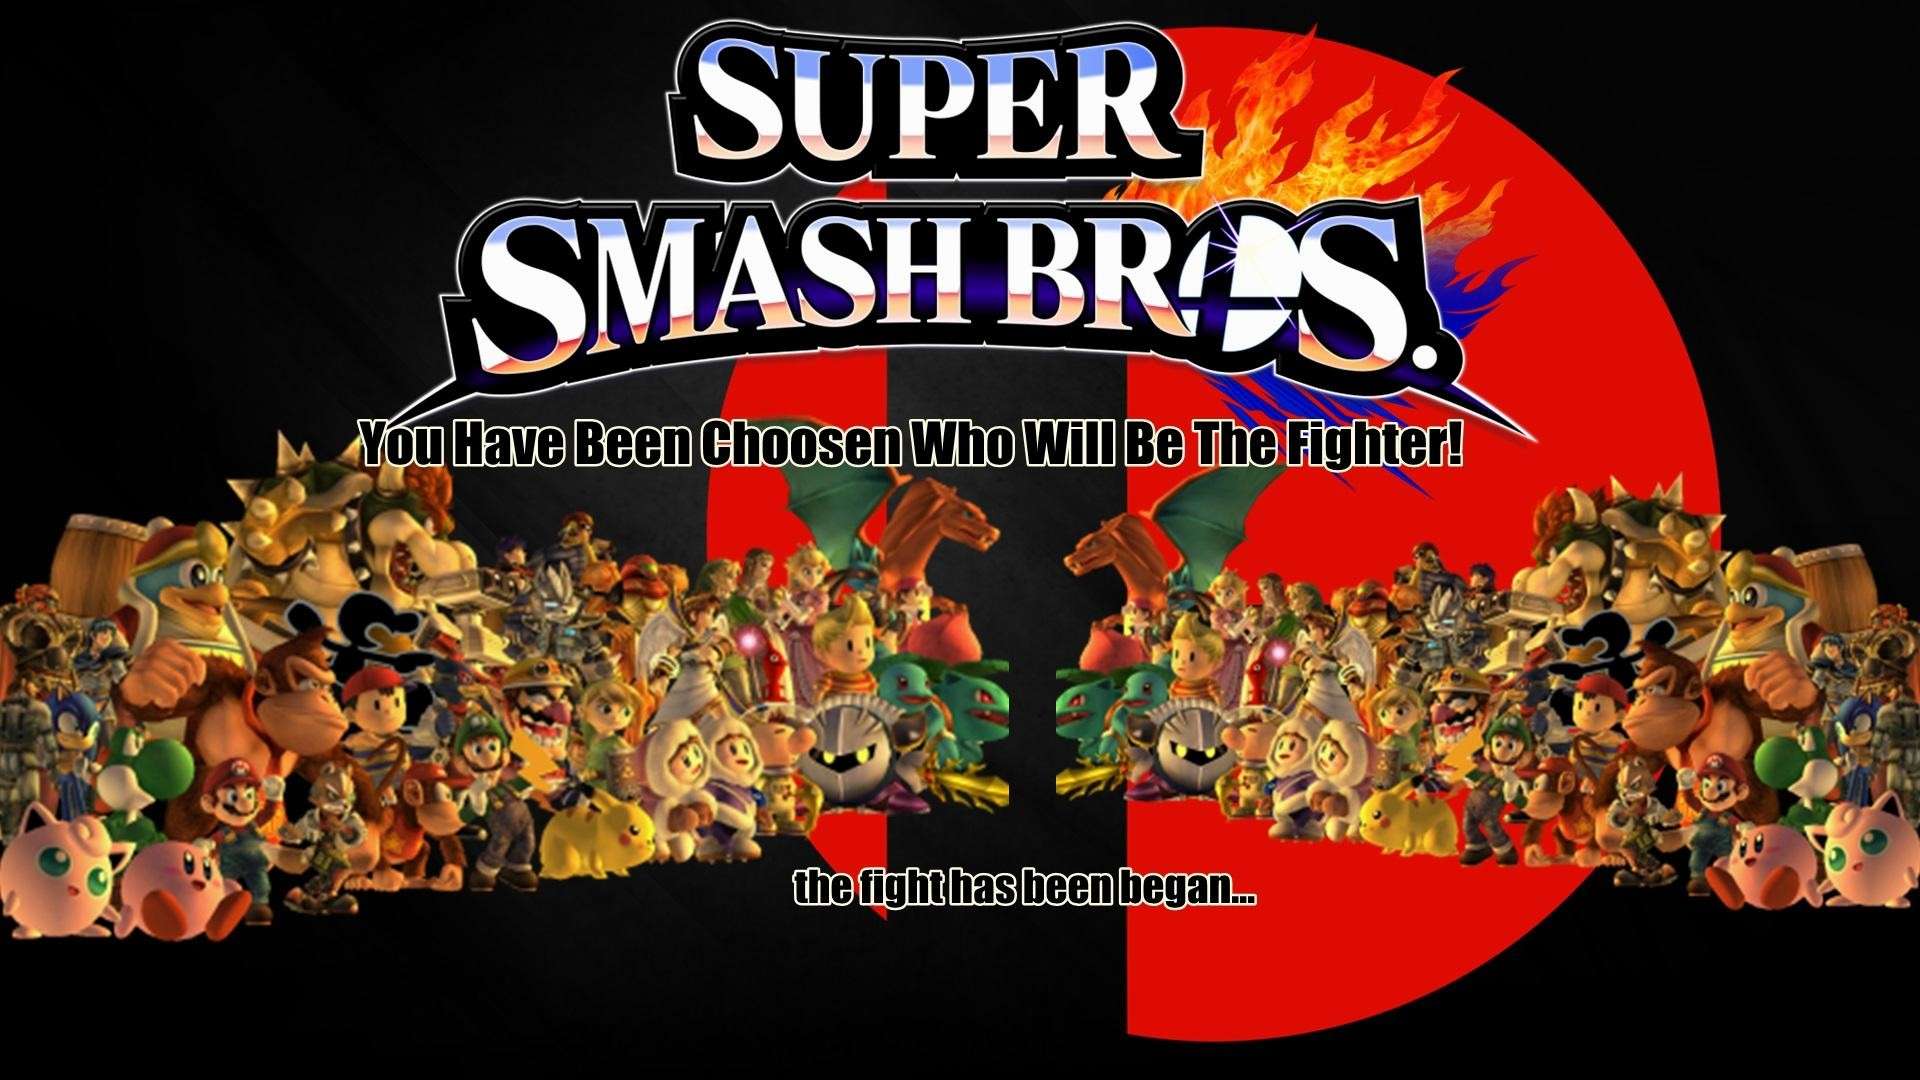 wallpaper.wiki-Pictures-Super-Smash-Bros-HD-Wallpaper-